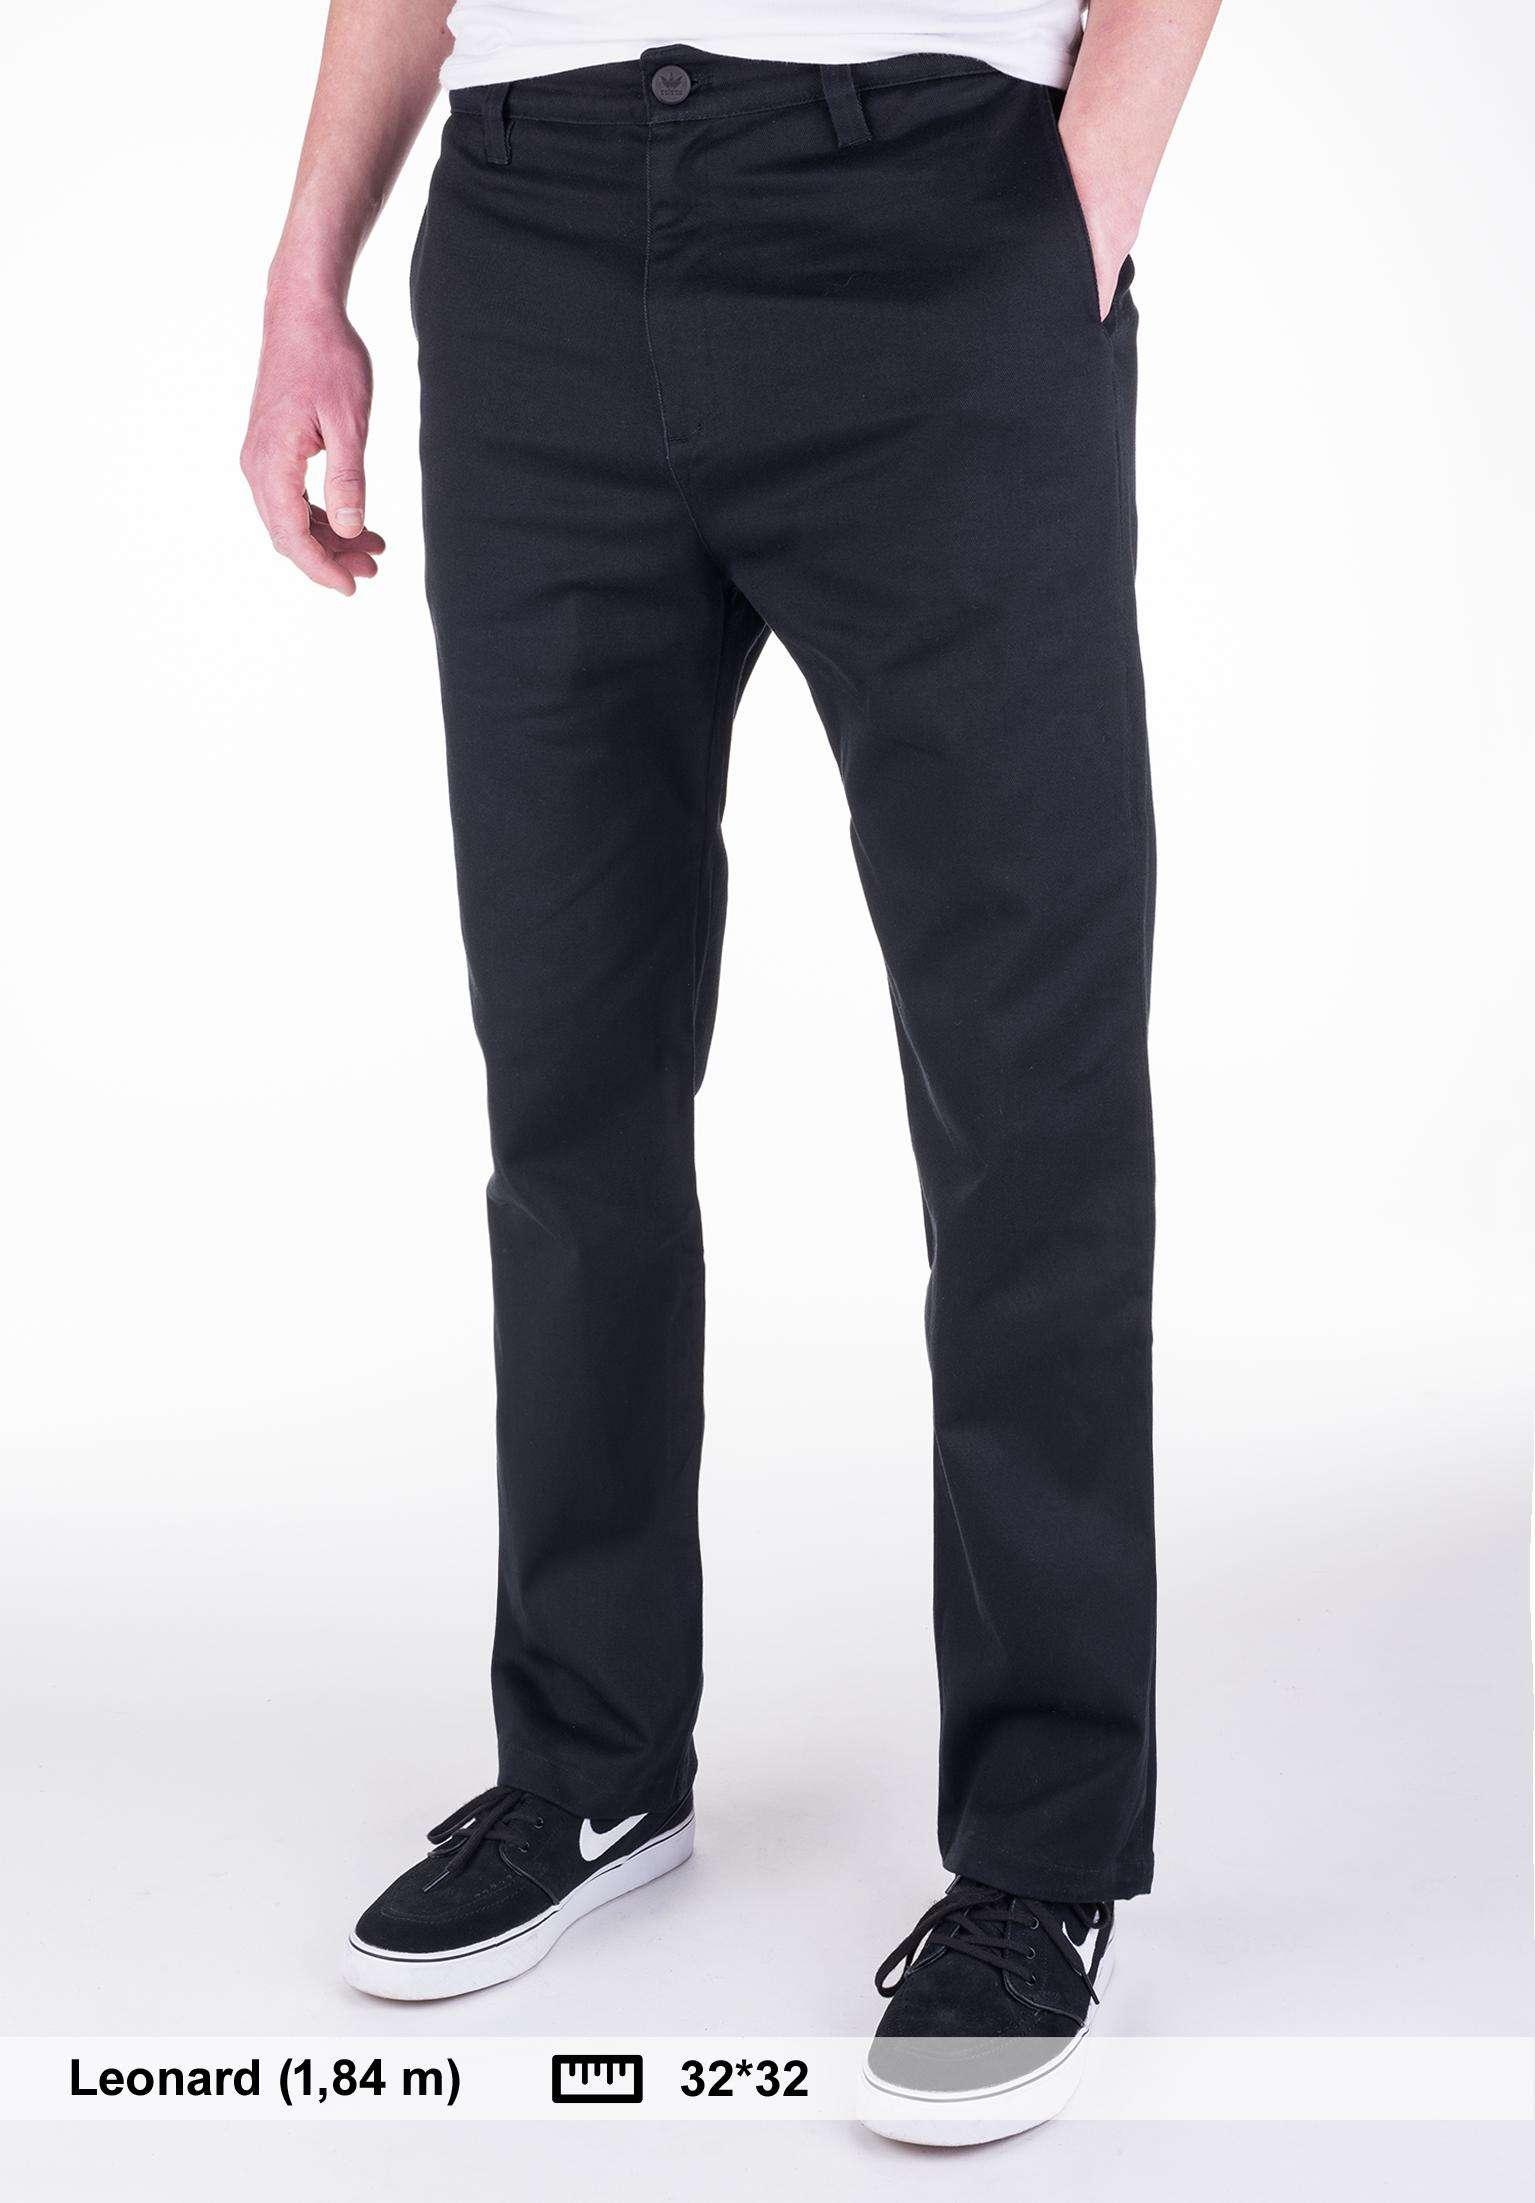 Adi Chino adidas-skateboarding Pantalones Chinos in black für Hombre ... 8213a7978a8